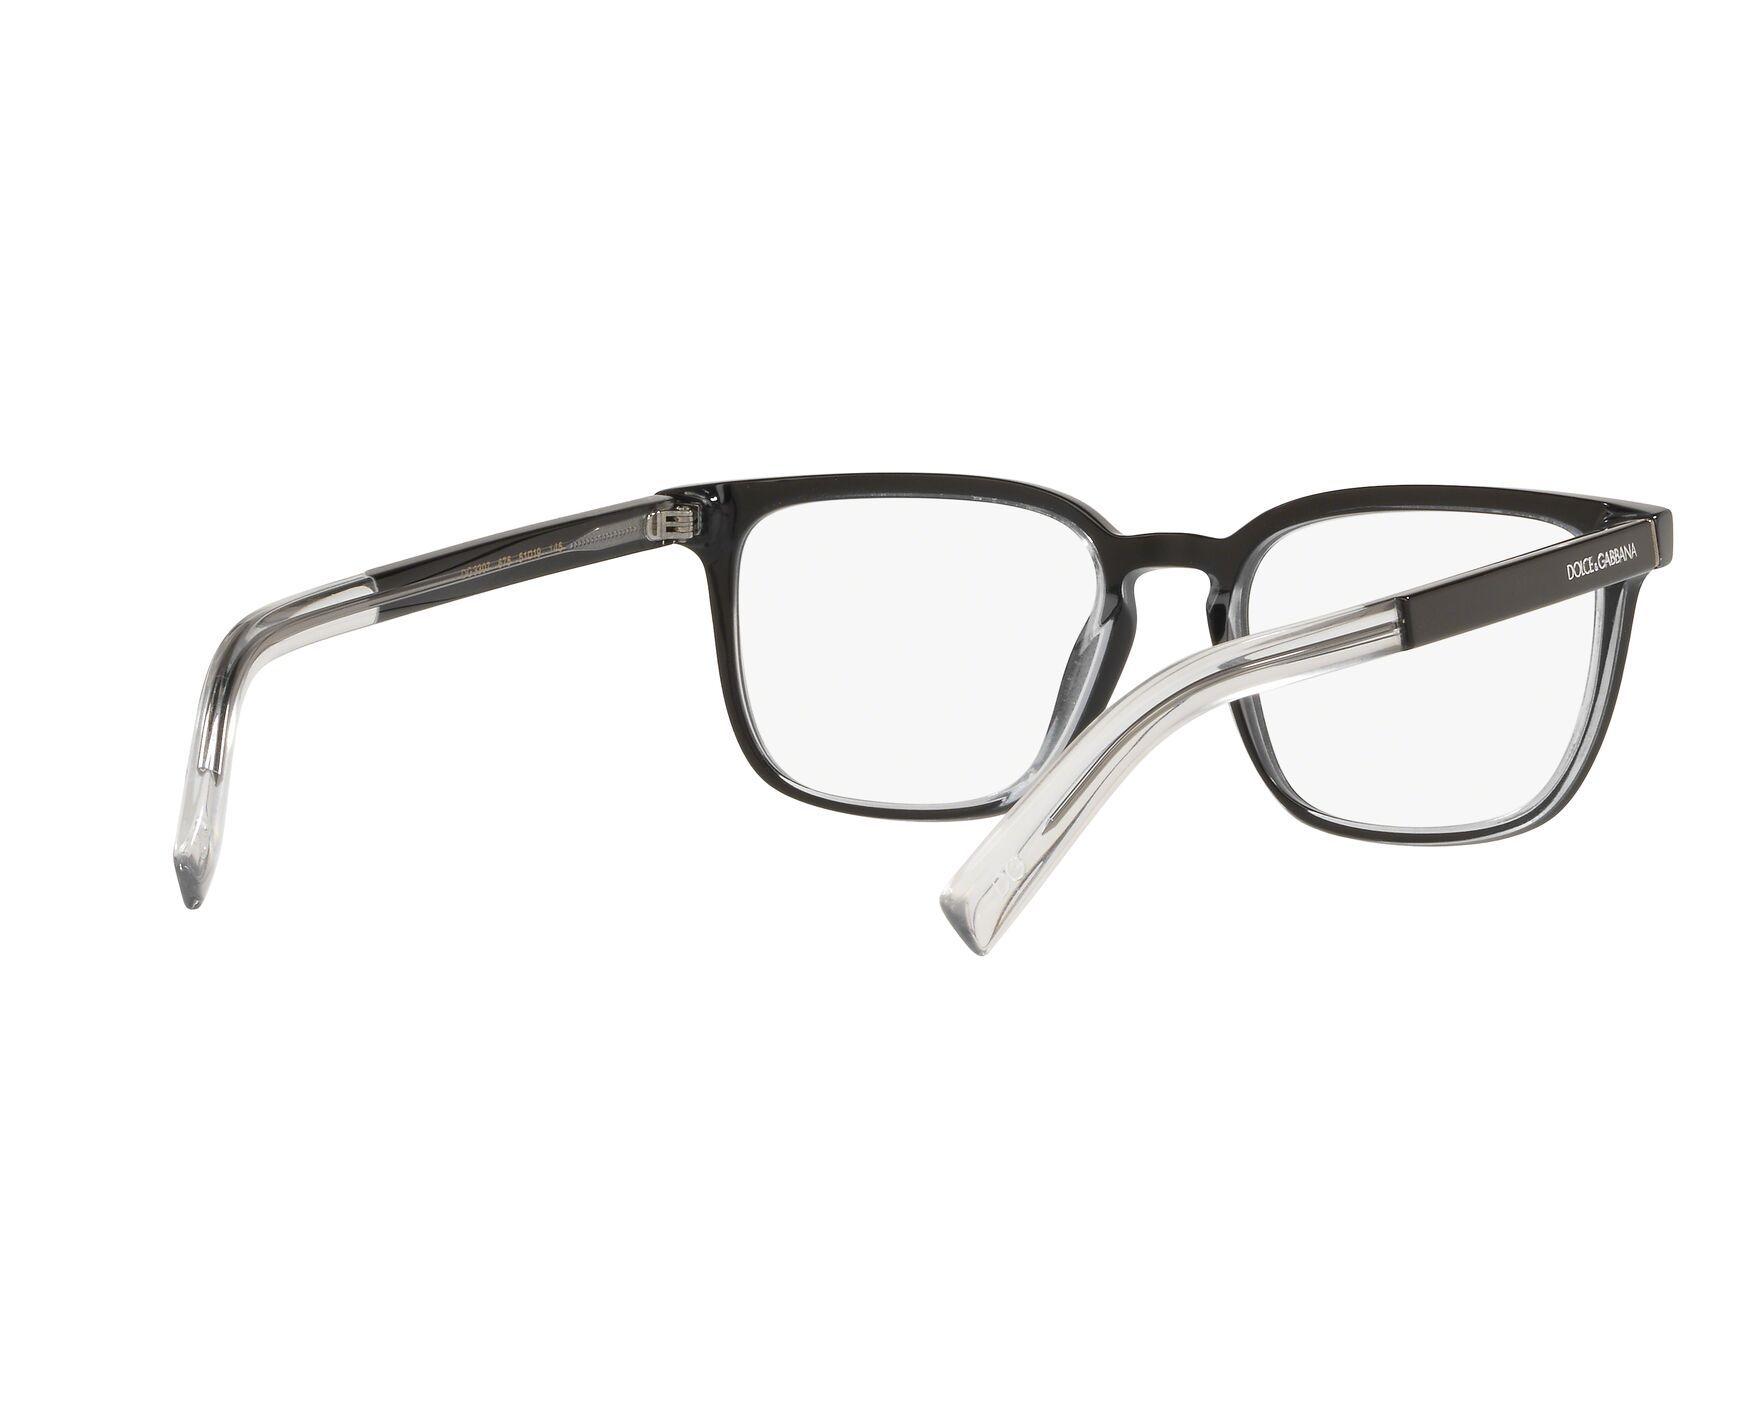 Dolce & Gabbana Glasses DG-3307 675